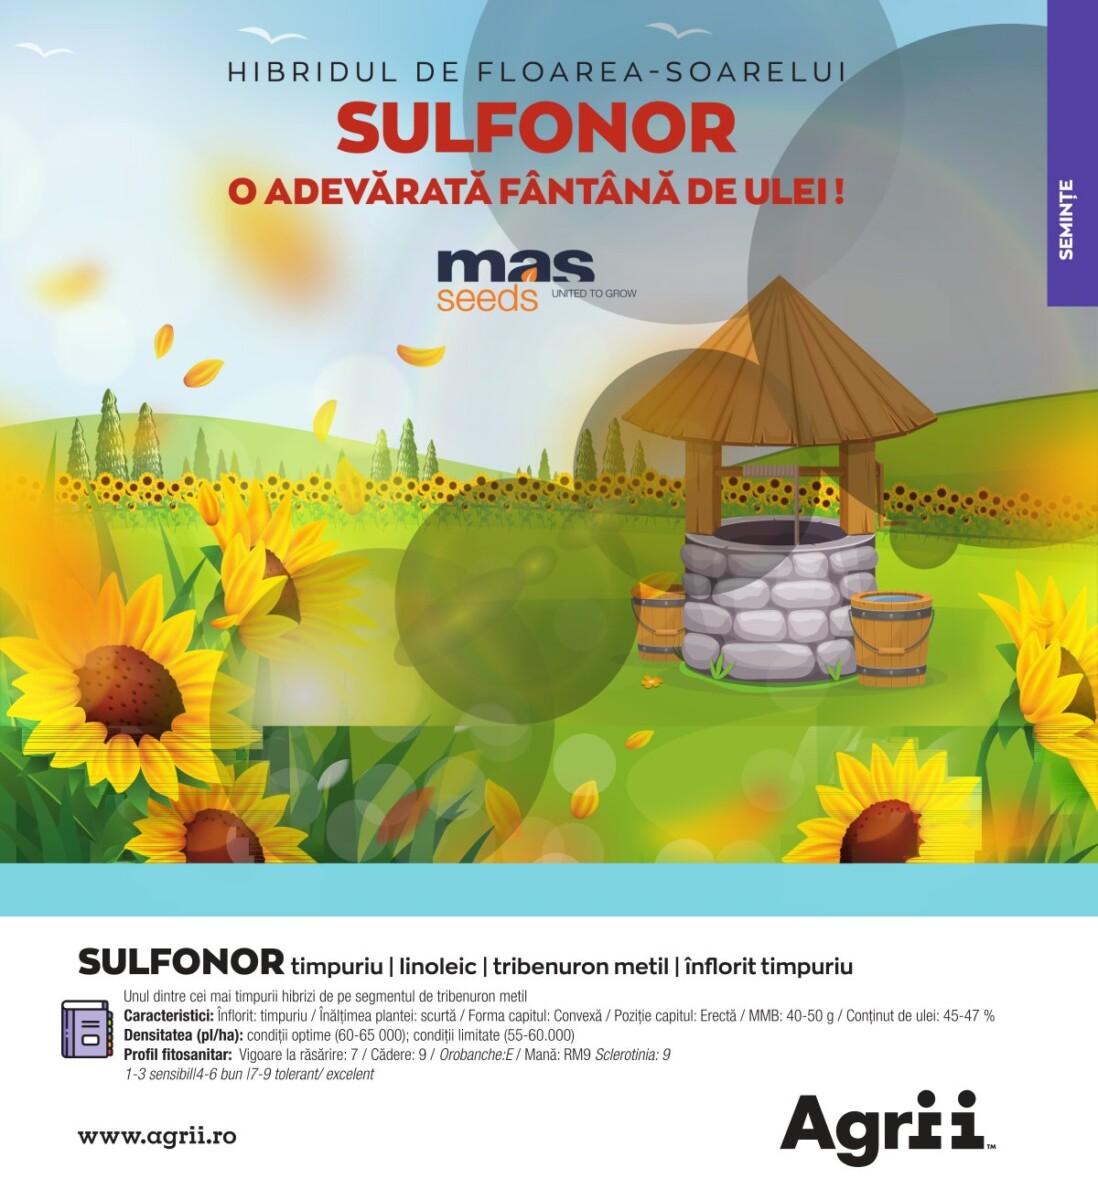 Sulfonor